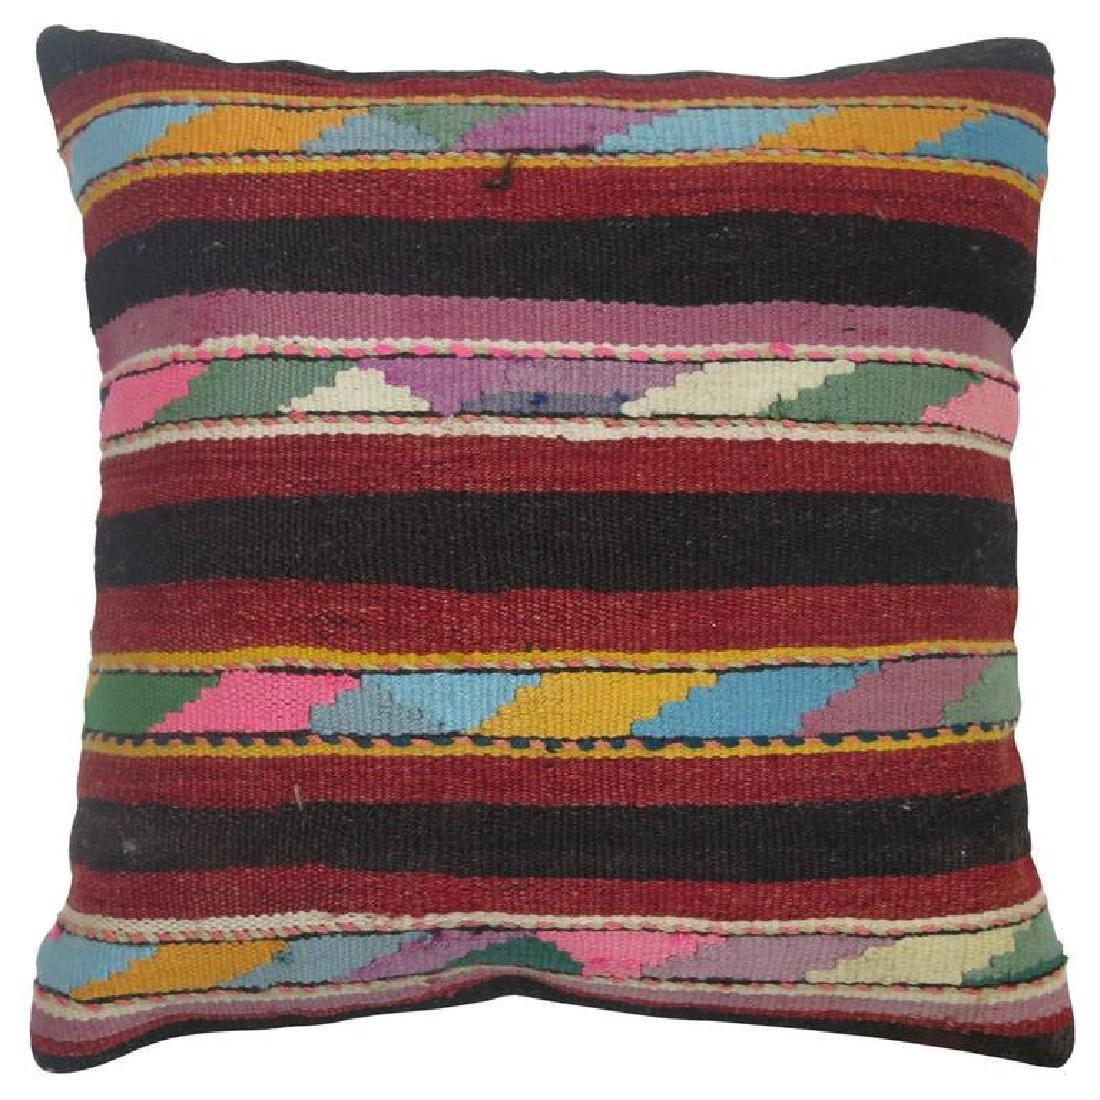 Colorful Kilim Rug Pillow 1.7x1.8